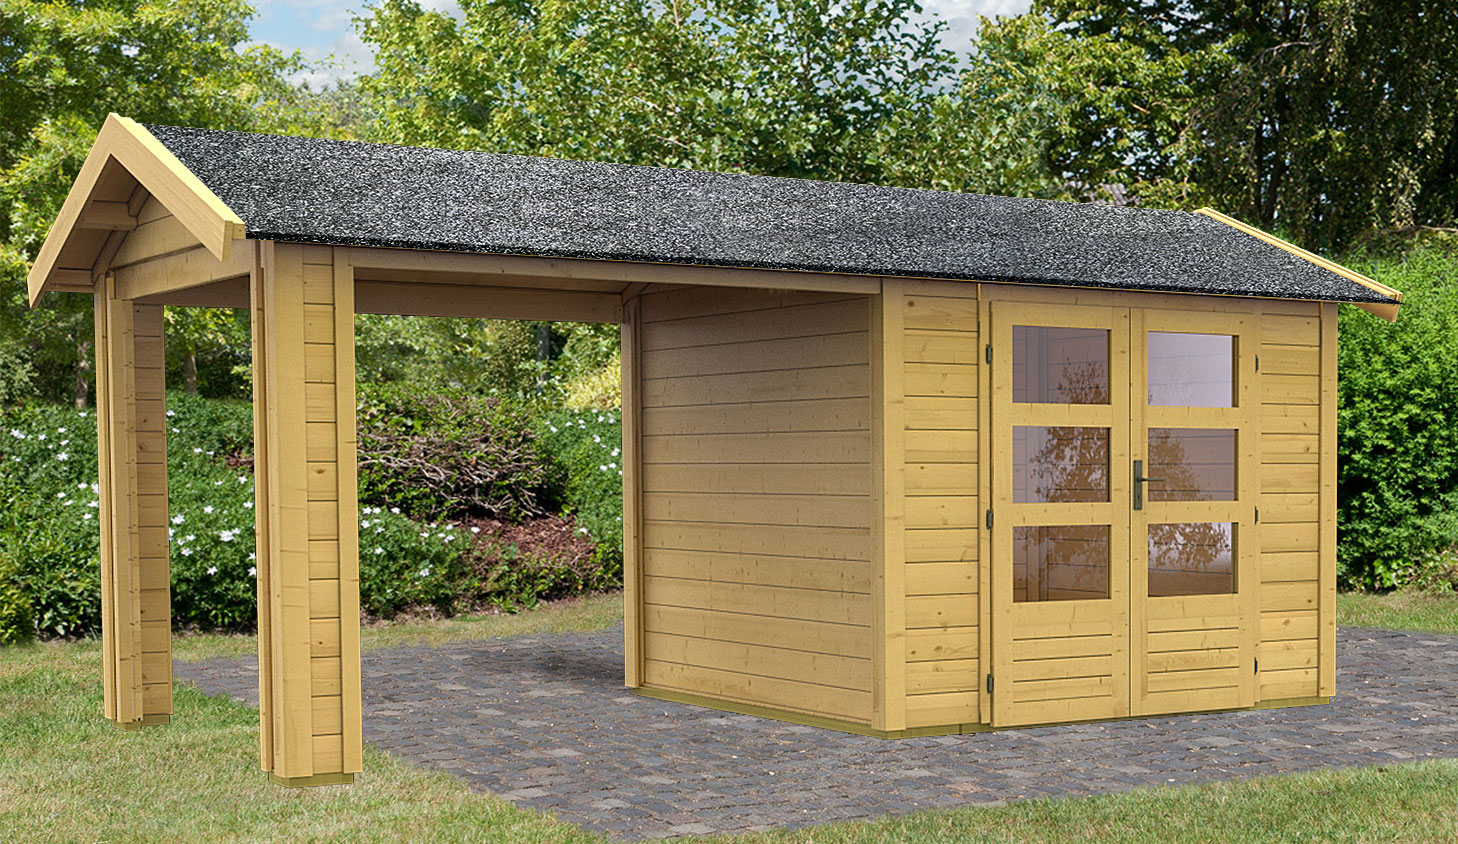 woodfeeling gartenhaus 28 mm thor 3 natur 281x288cm set 1 bei. Black Bedroom Furniture Sets. Home Design Ideas